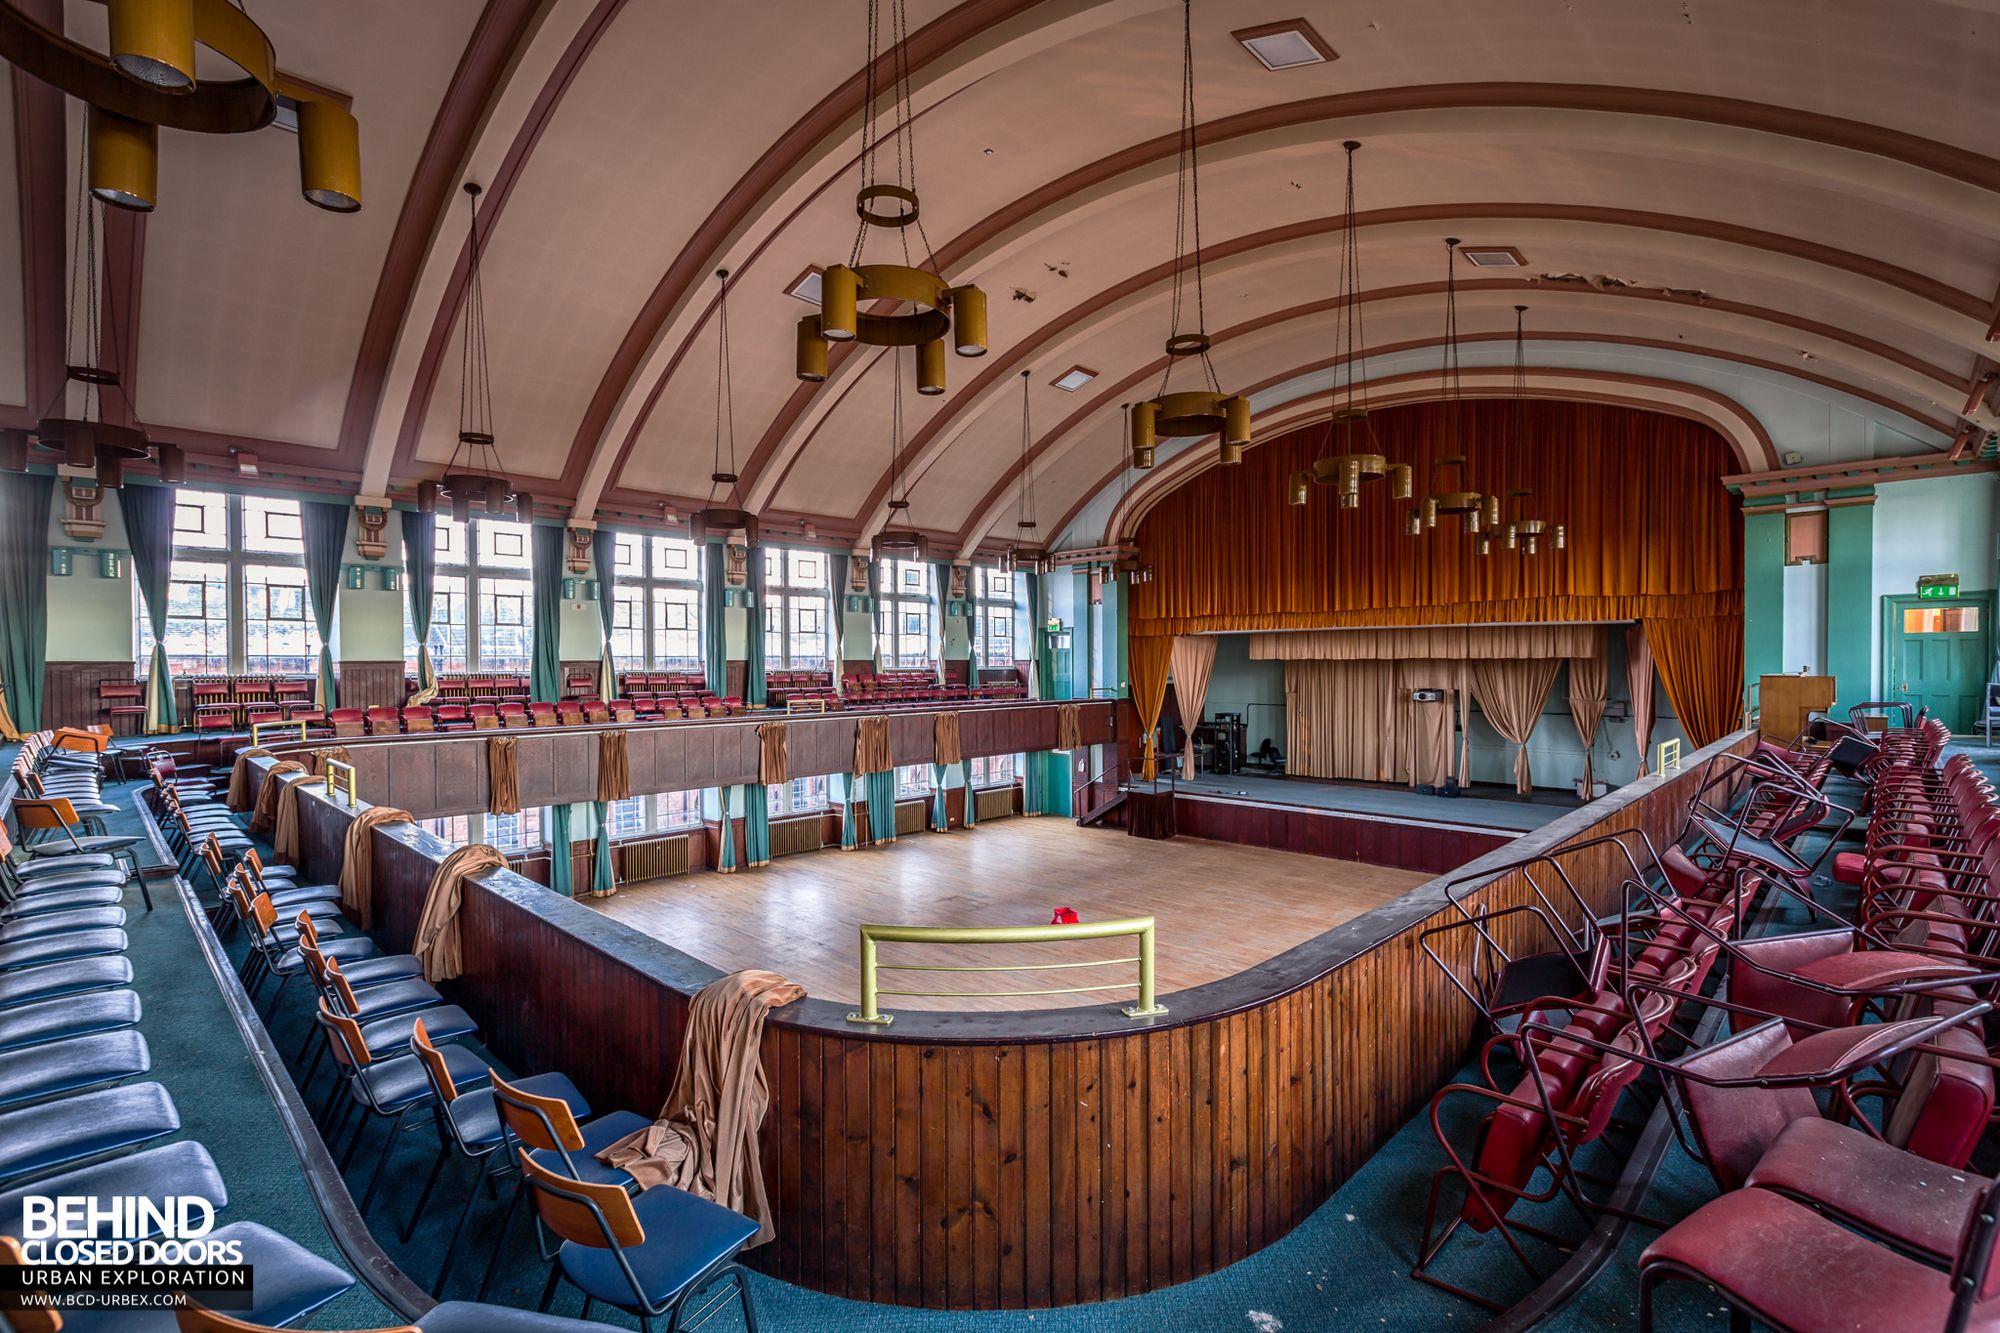 Jordanhill College Glasgow Scotland Urbex Behind Closed Doors Urban Exploring Abandoned Locations